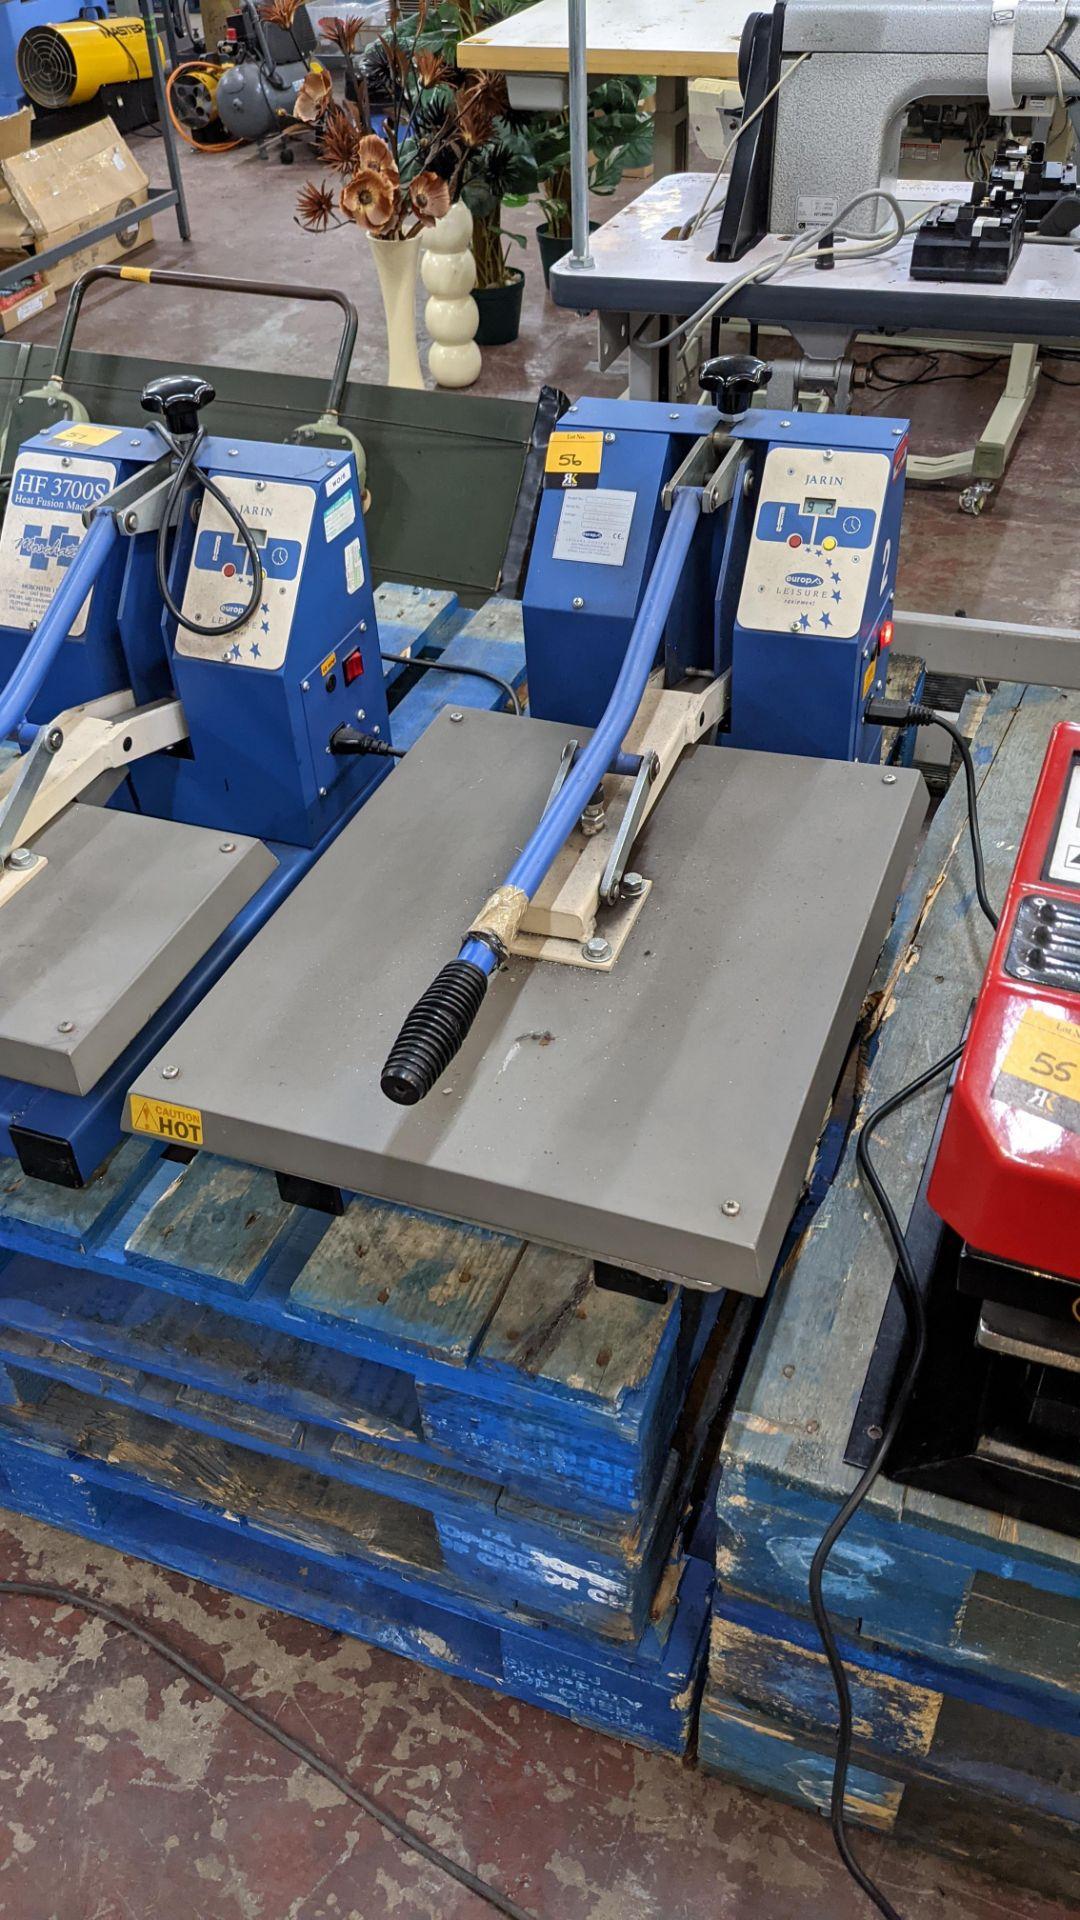 Europa Jarin benchtop heat transfer press model HF5000